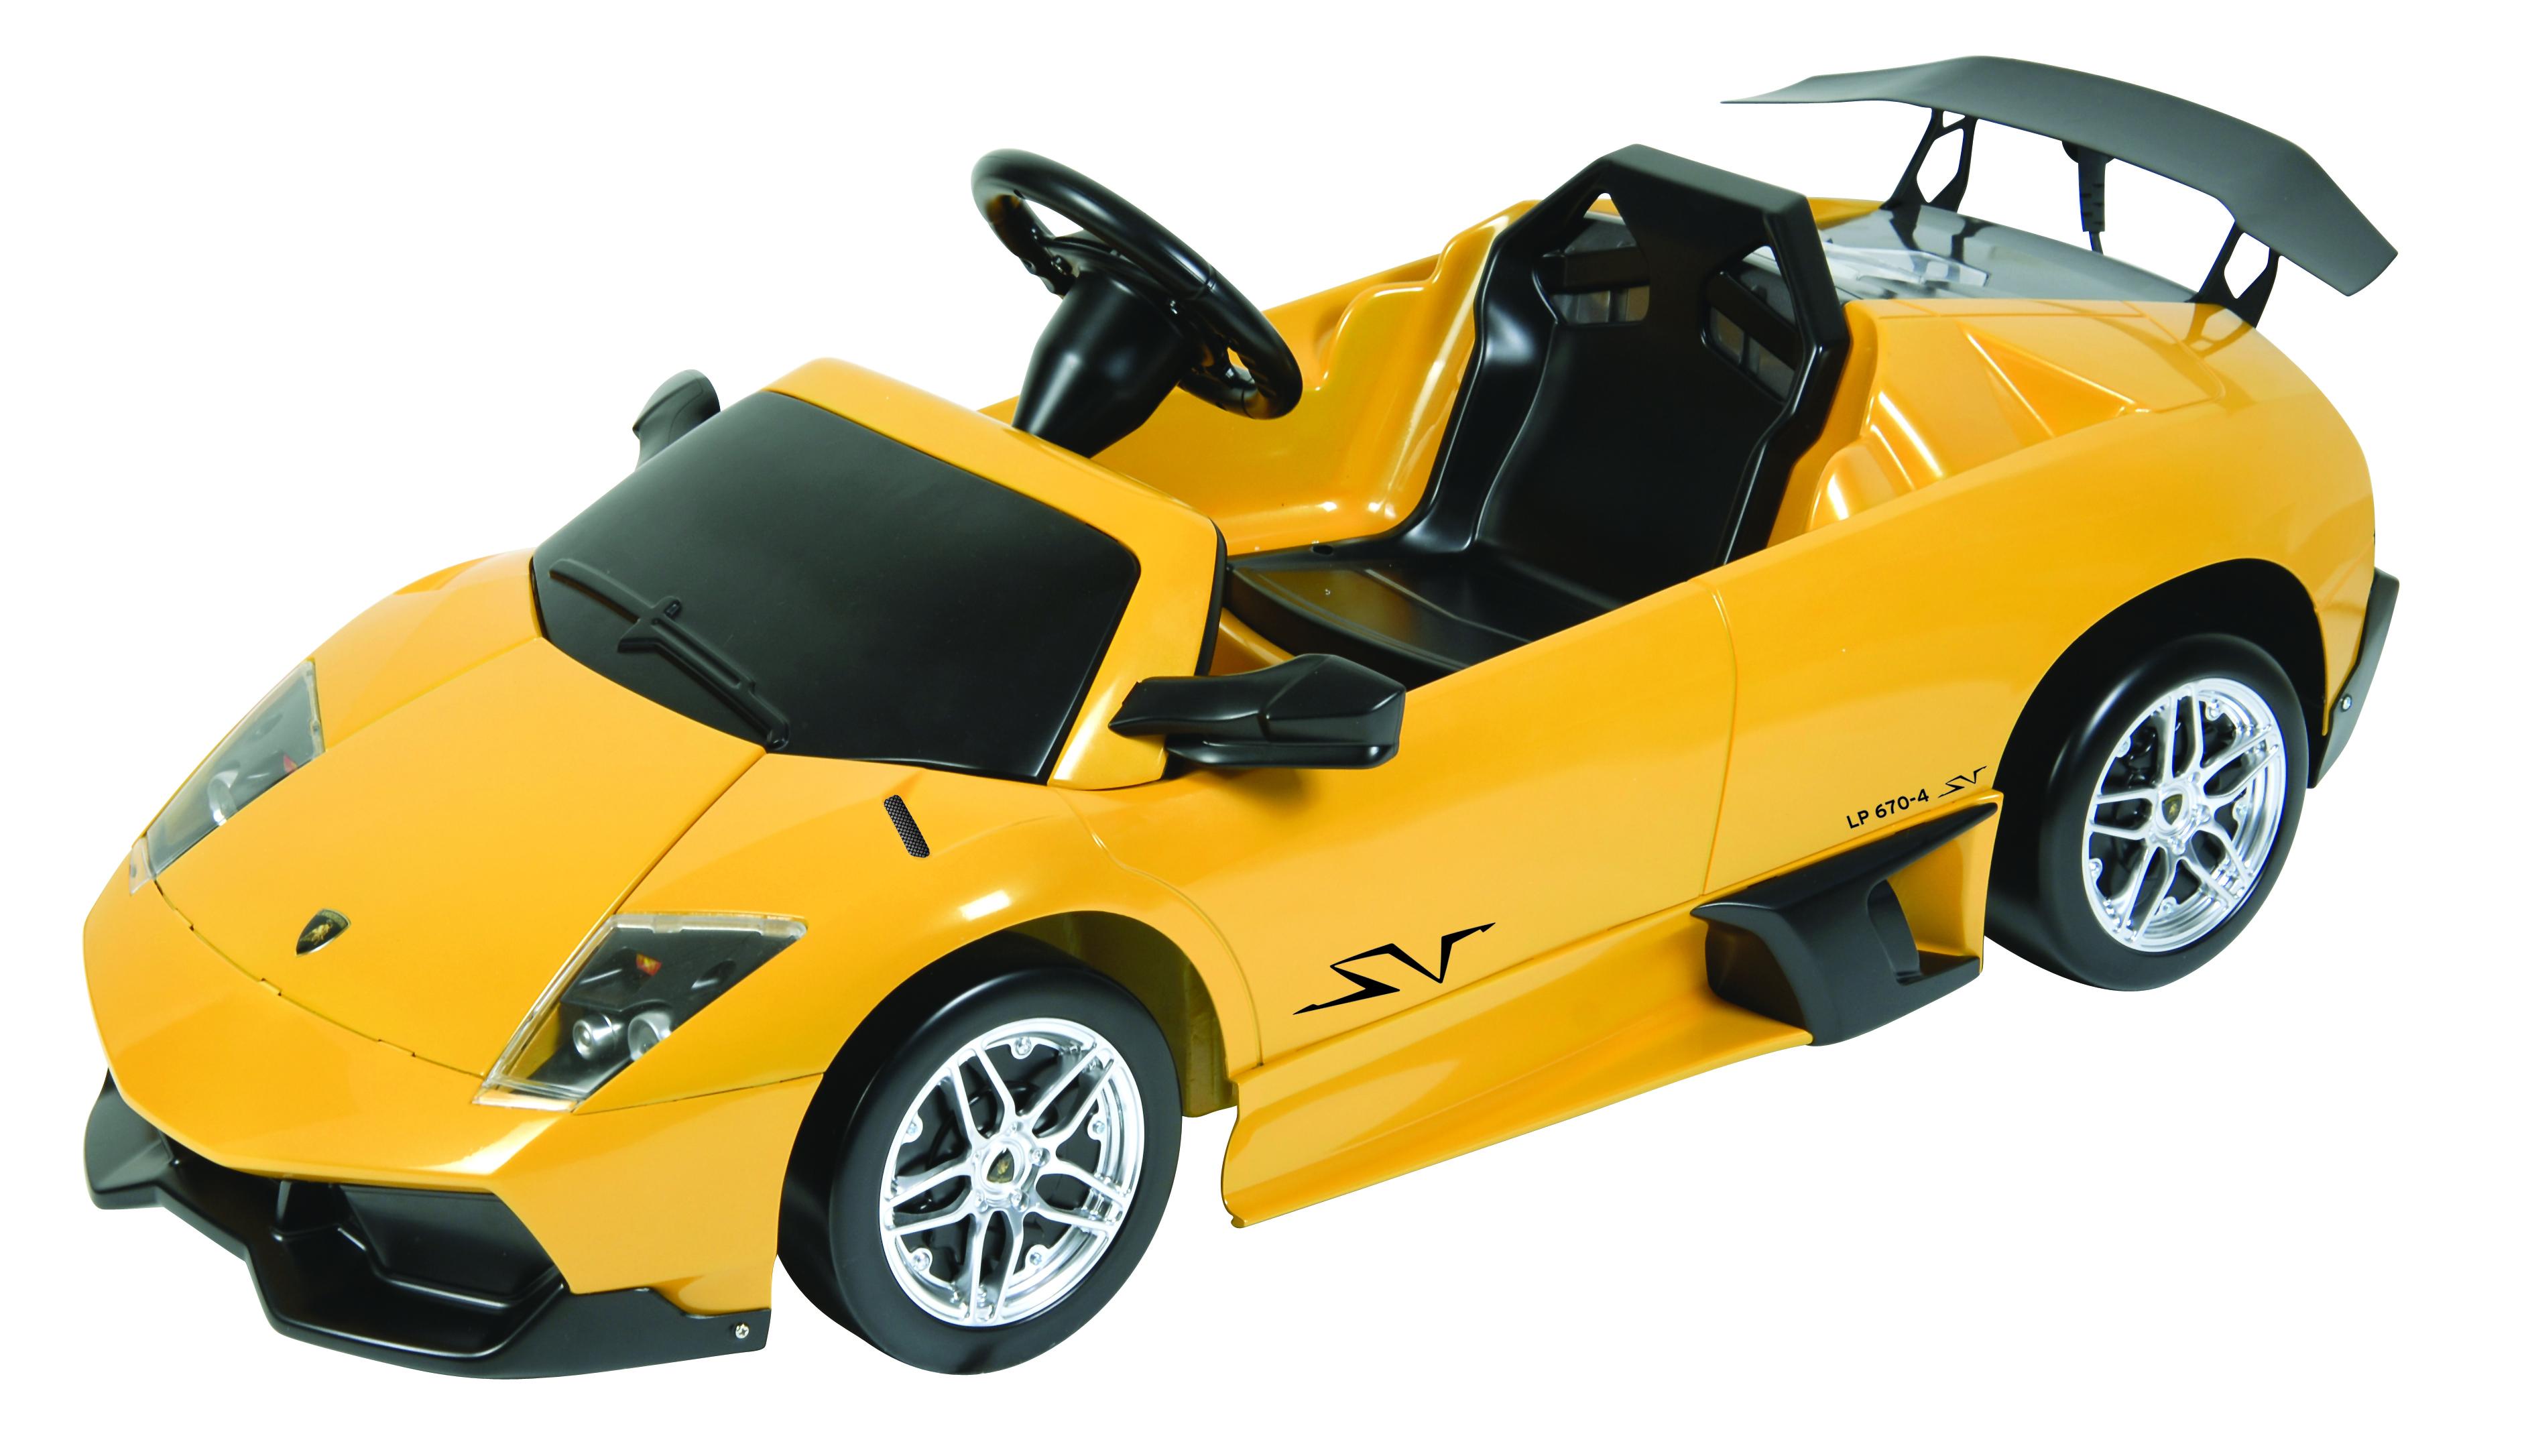 Dexton Lamborghini Murcieaglo LP 670 4 12V Ride On Toy